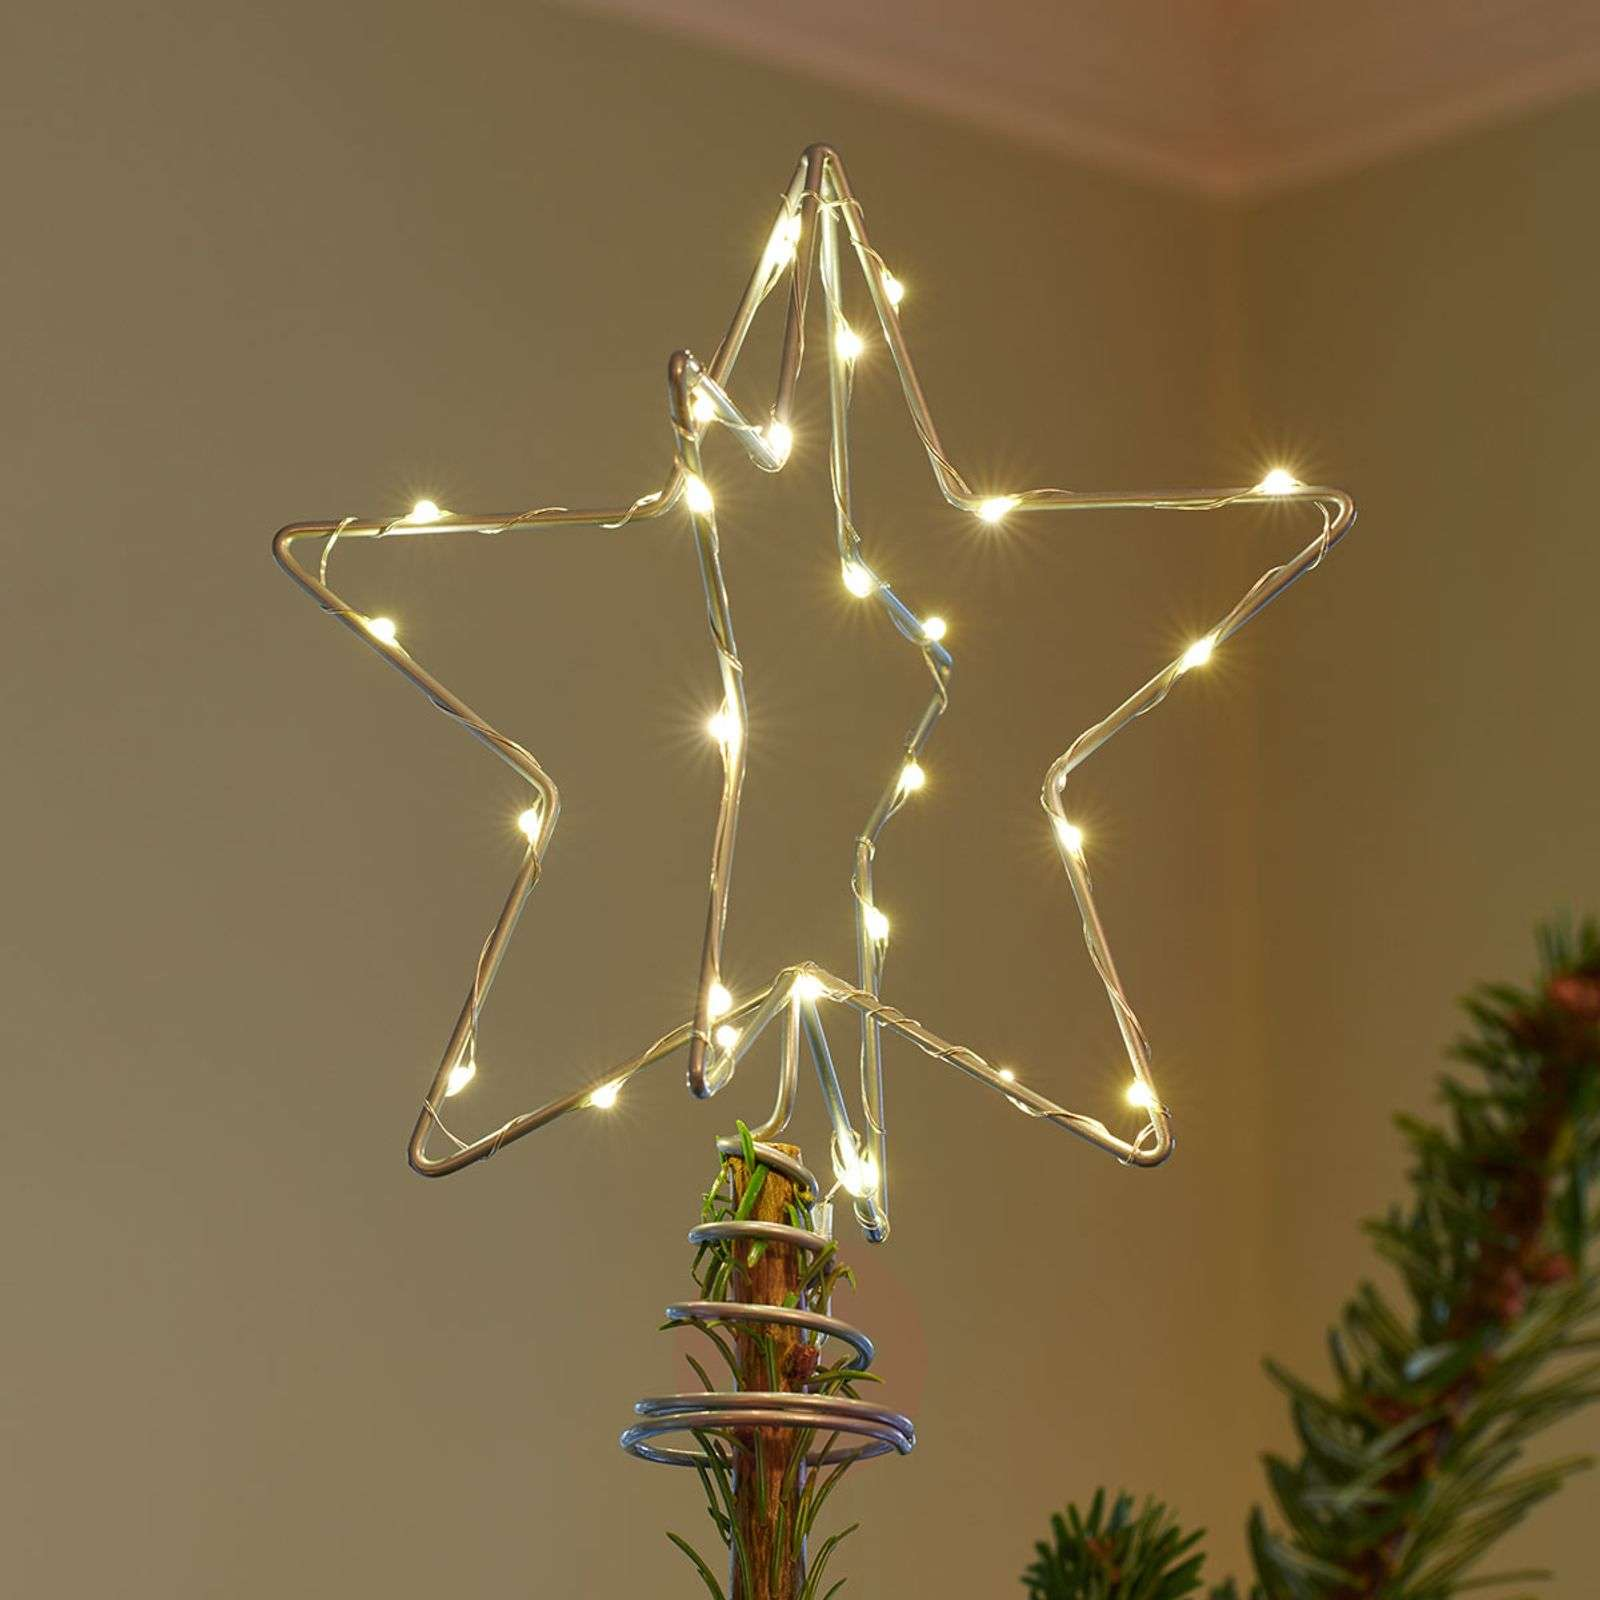 LED-koristevalaisin Christmas Top, hopea-8577270-01